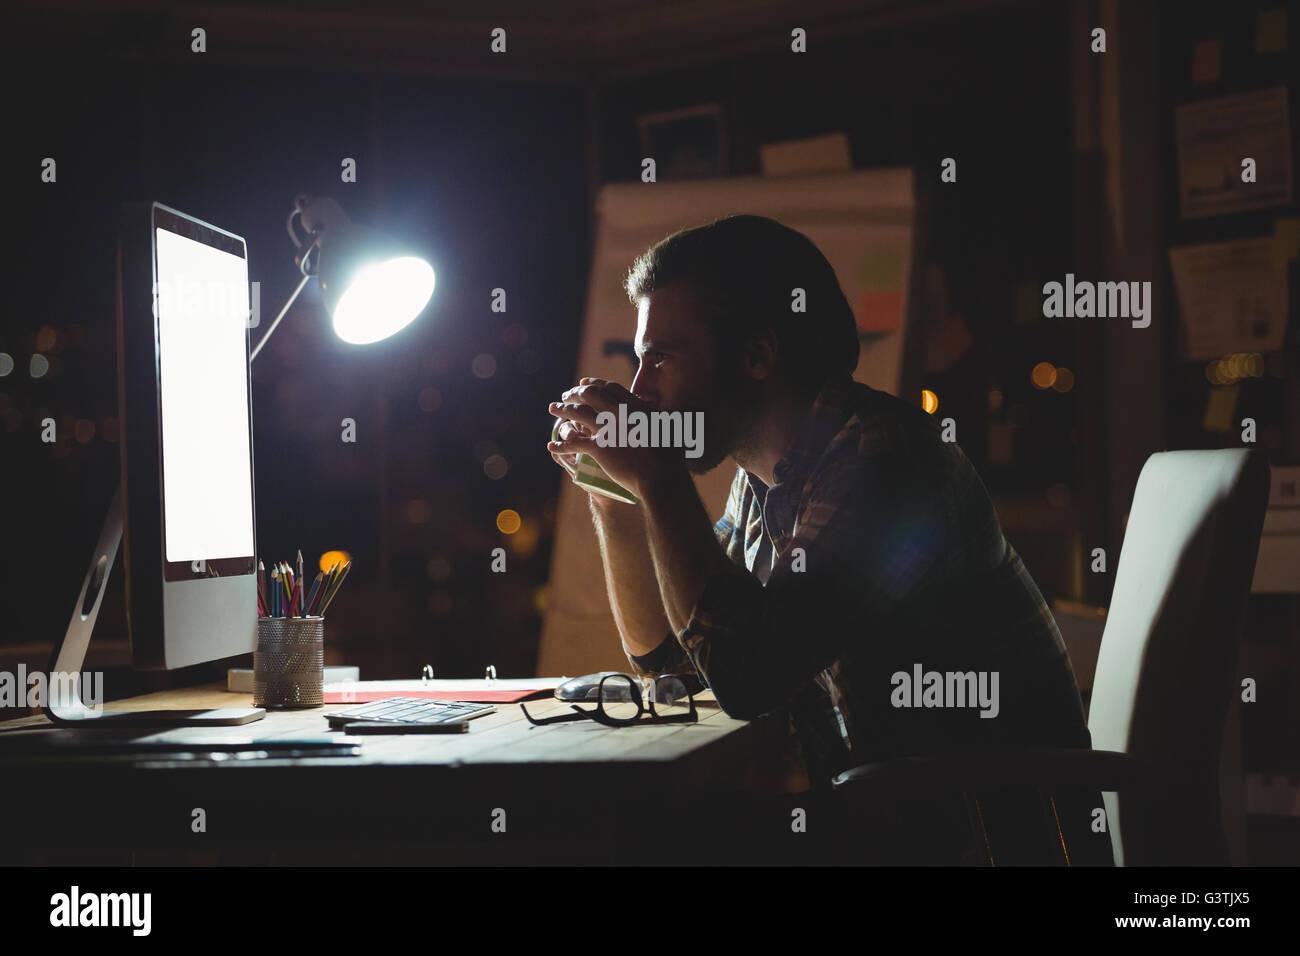 Businessman drinking coffee at night Photo Stock